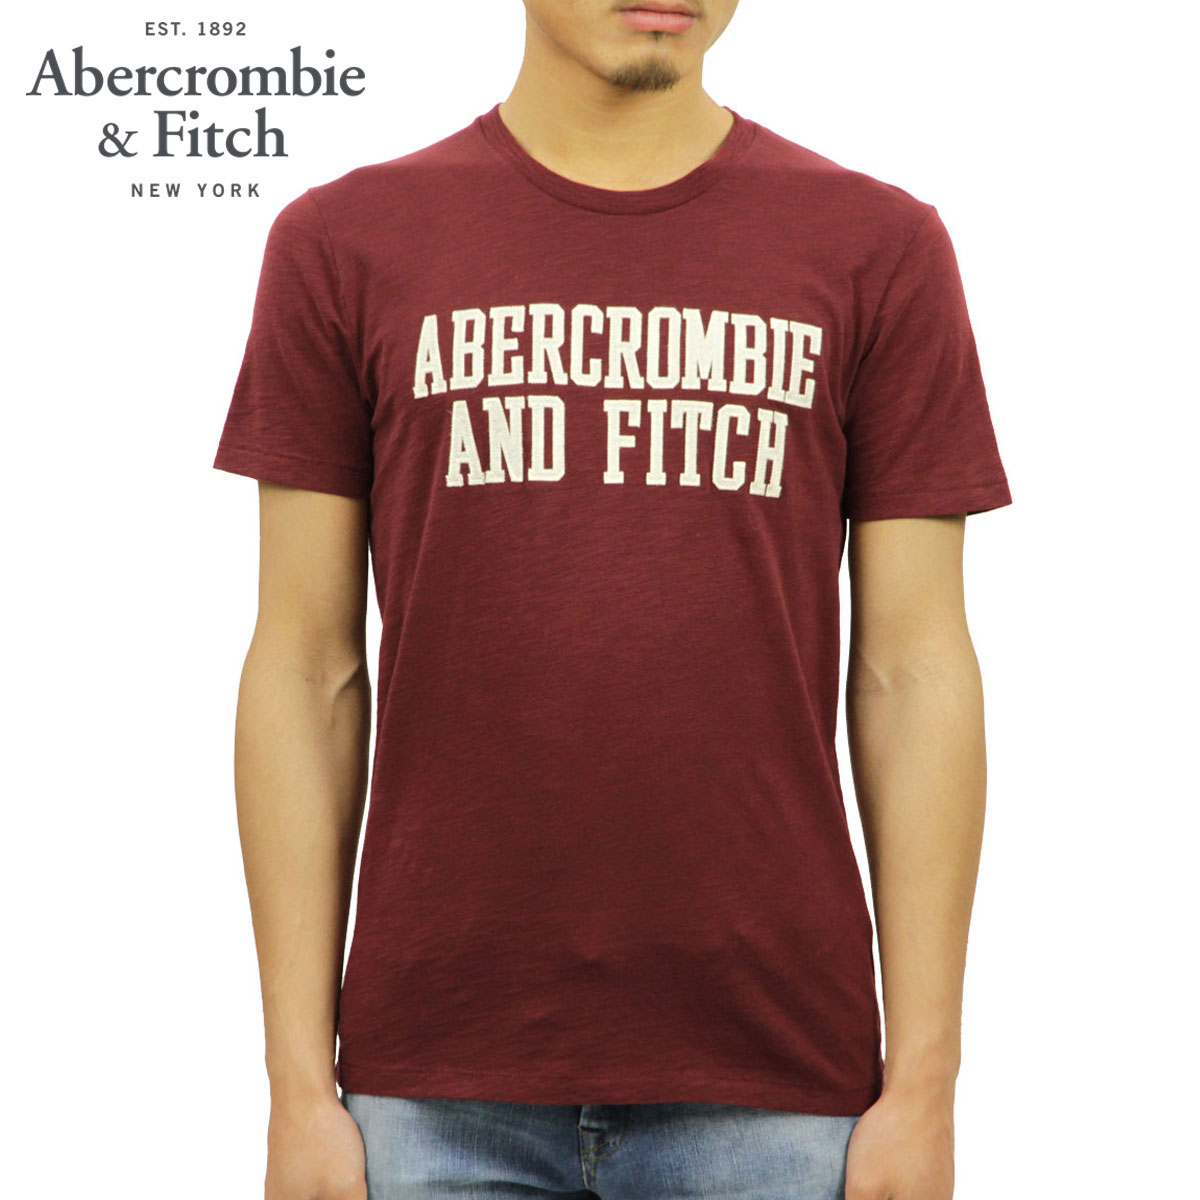 7f0d46fdc ABBA black Abercrombie & Fitch regular article men crew neck short sleeves  T-shirt ...